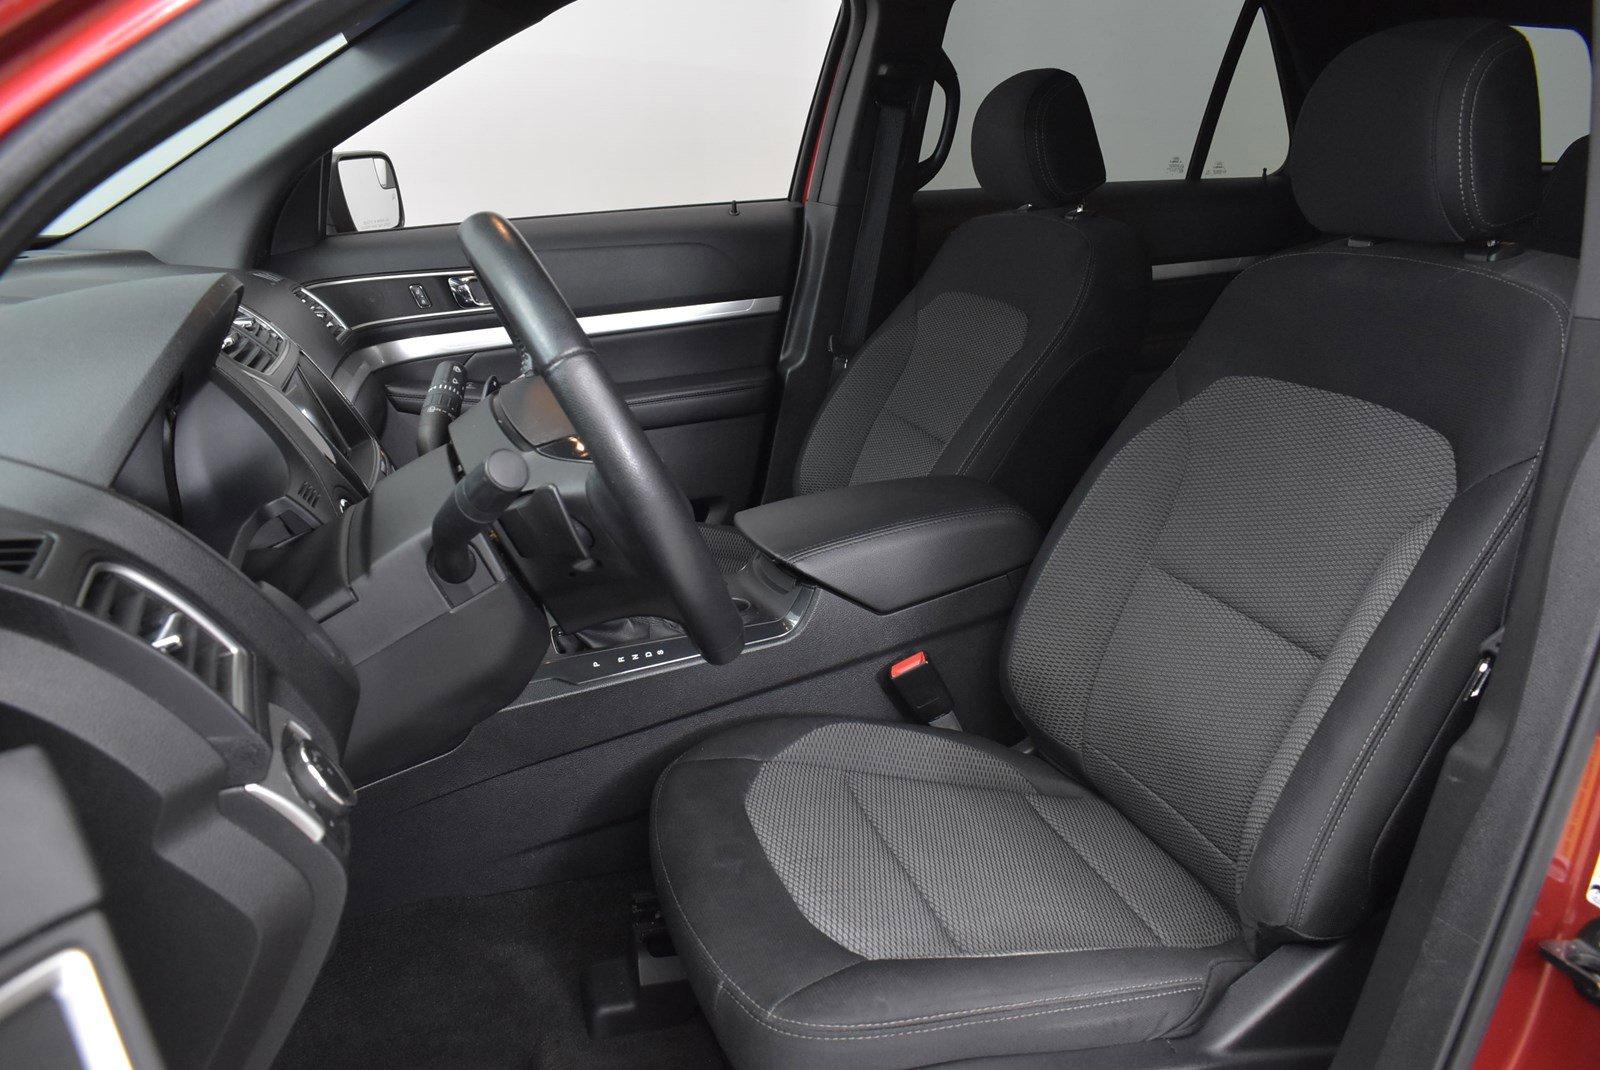 Pre-Owned 2016 Ford Explorer XLT